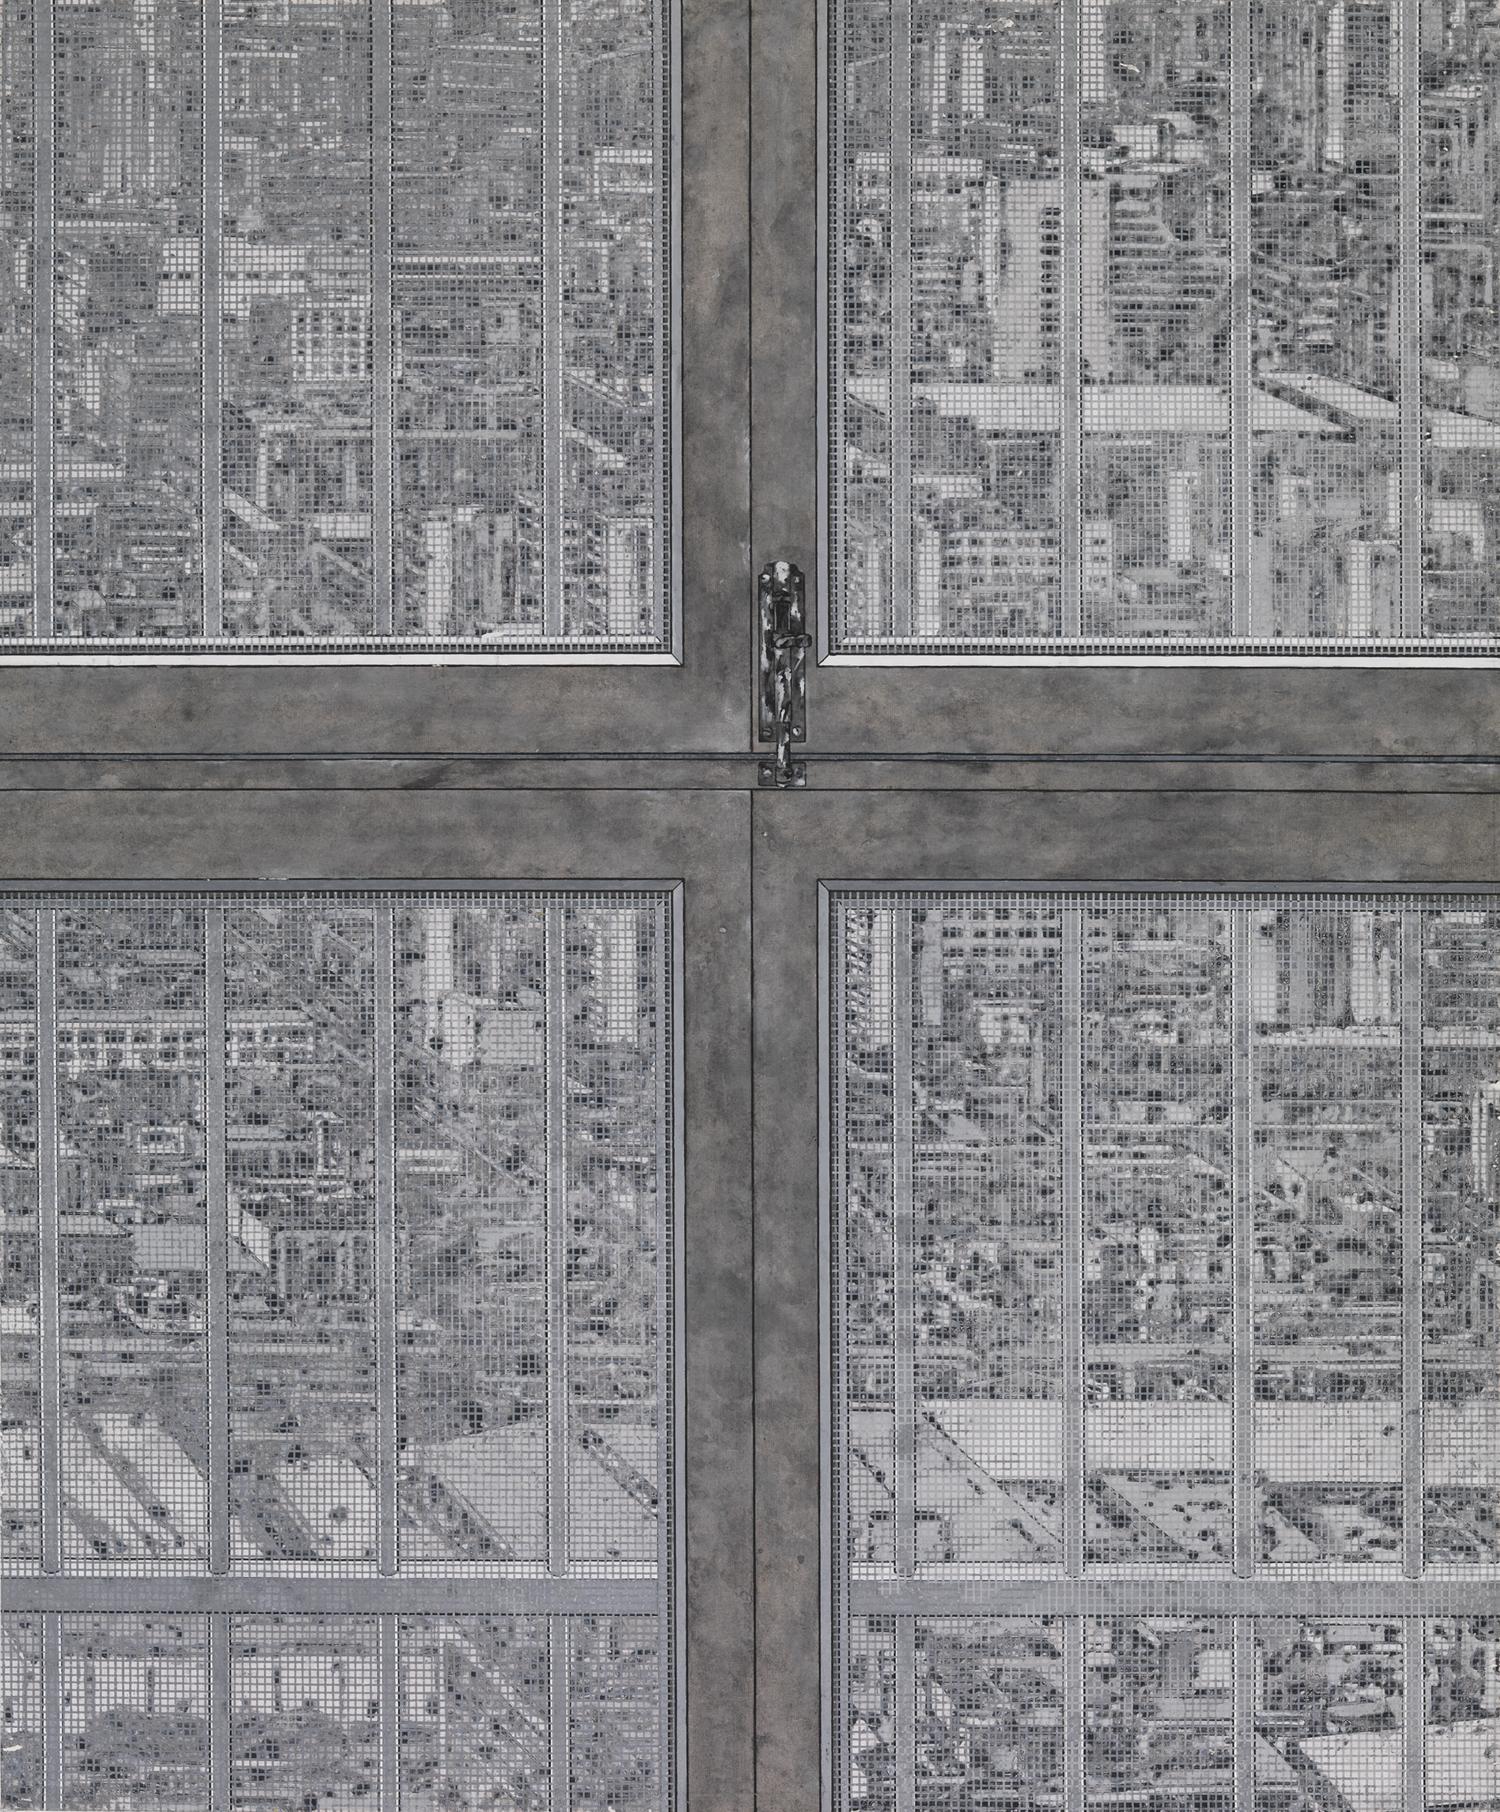 Peng Jian 彭剑, Revelation of the Cross 十字启示, 2011, Ink on paper 纸本水墨, 120 x 100 cm